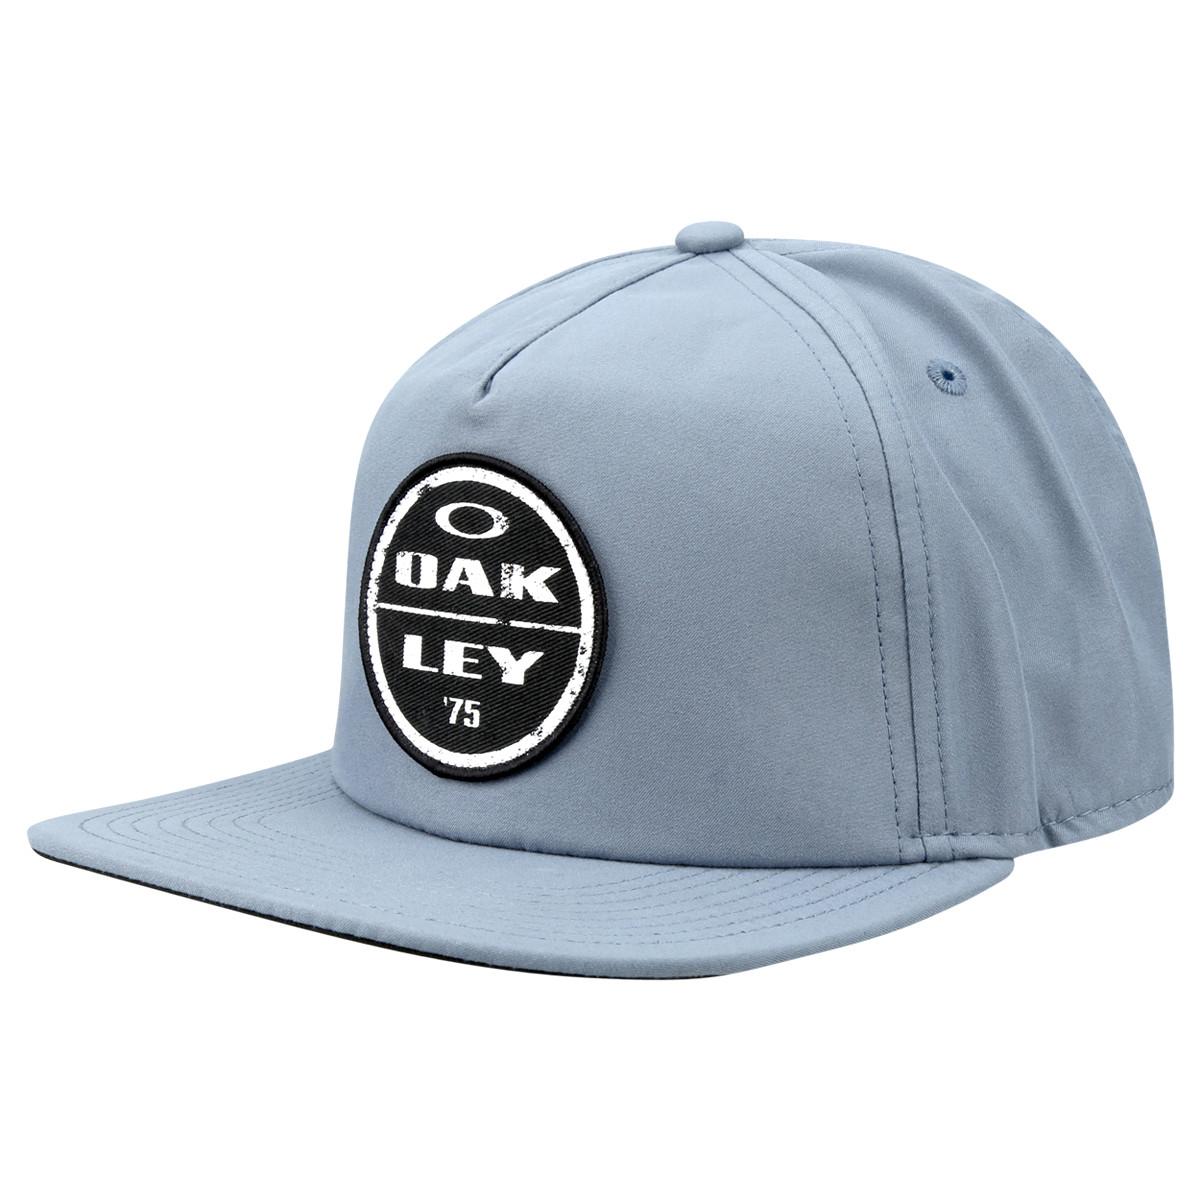 Boné Oakley Foundation Cap Snapback Azul Bebe ref 911510-69T 219a4920fb2